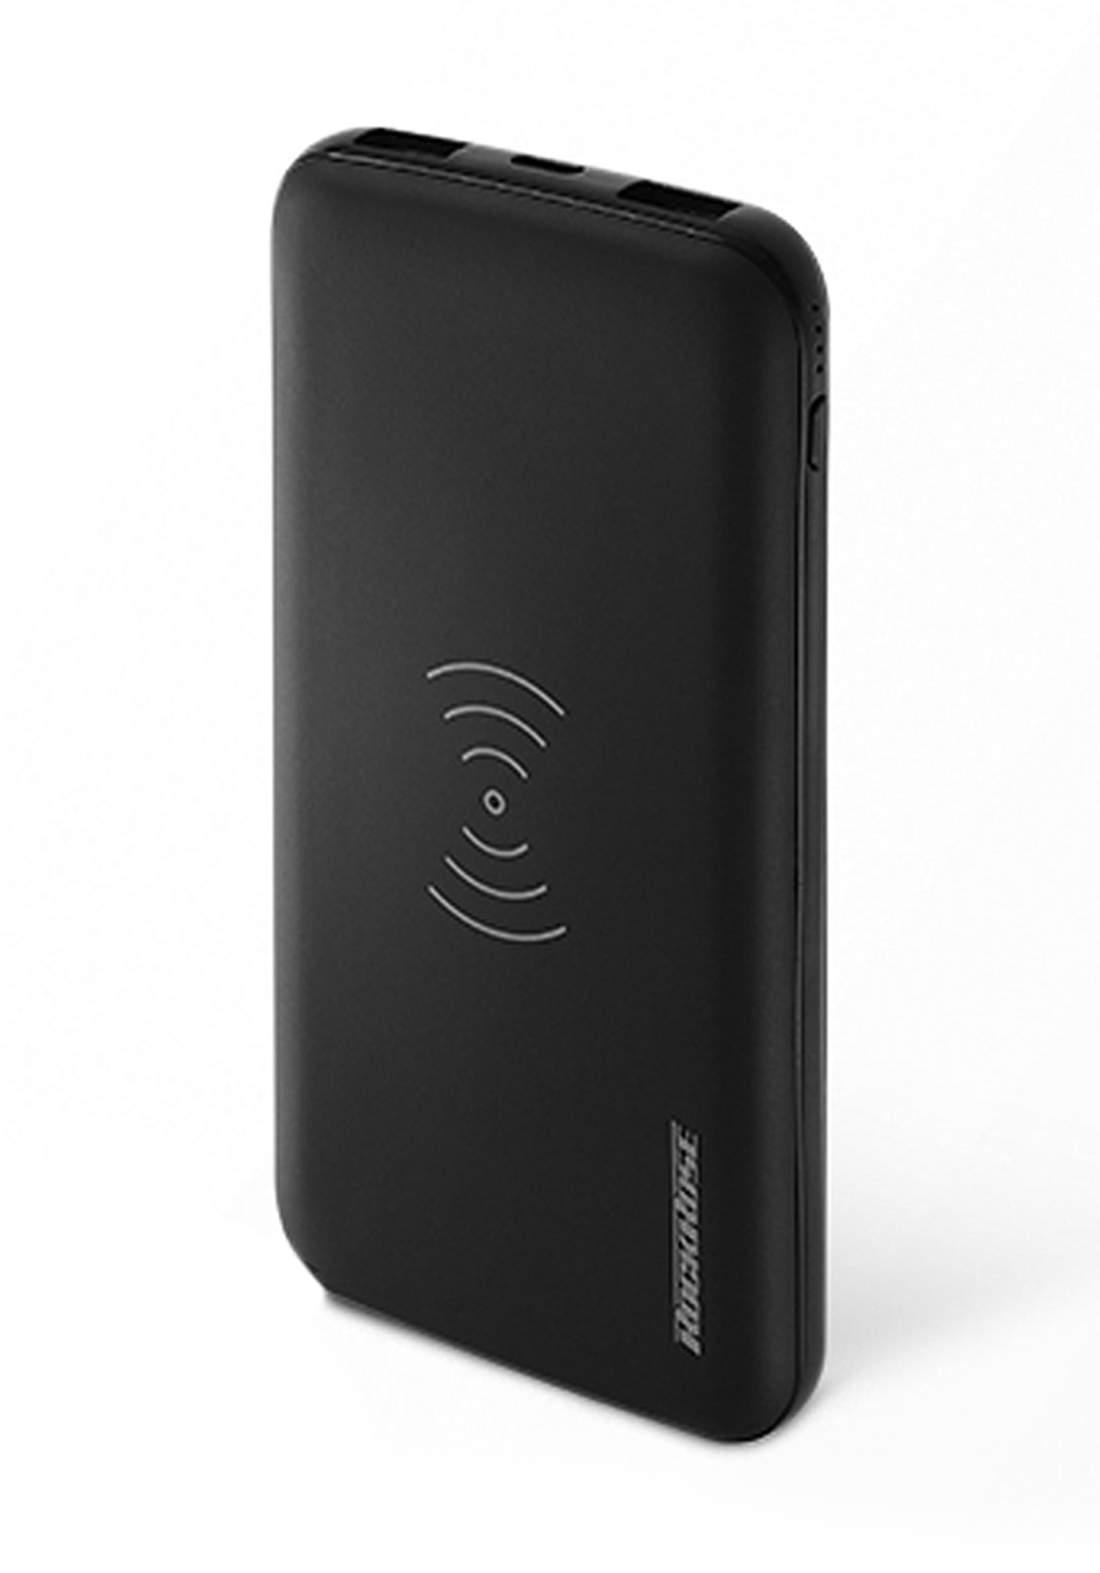 (4041)Rockrose RRPB12 Power Bank RRPB12 Airgo 10 Pro 10000mAh Wireless Charge PD & QC 3.0 - Black